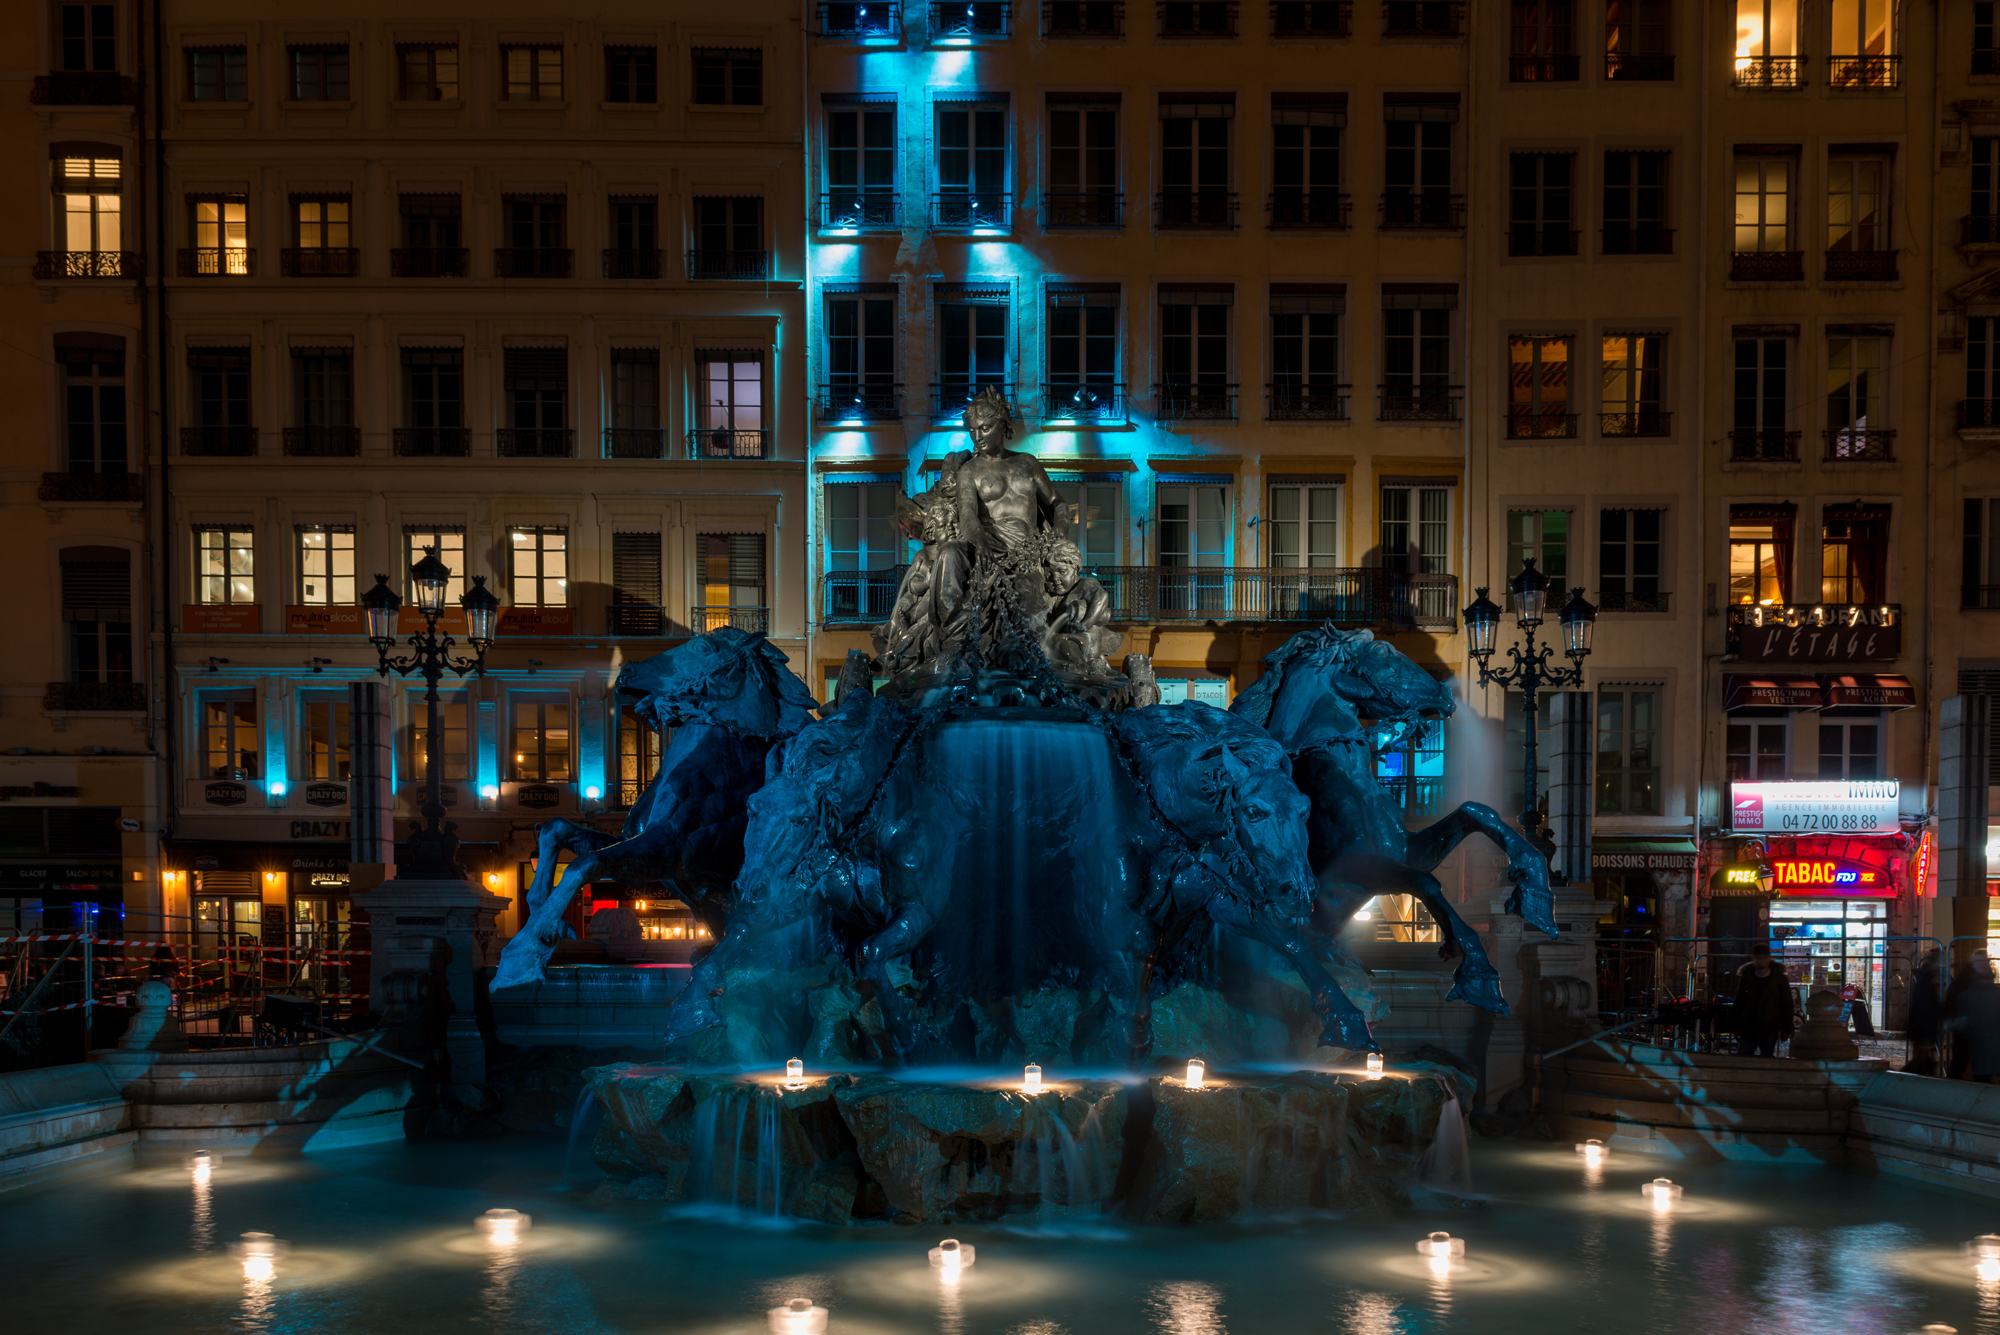 iGuzzini en la Fiesta de las Luces de Lyon